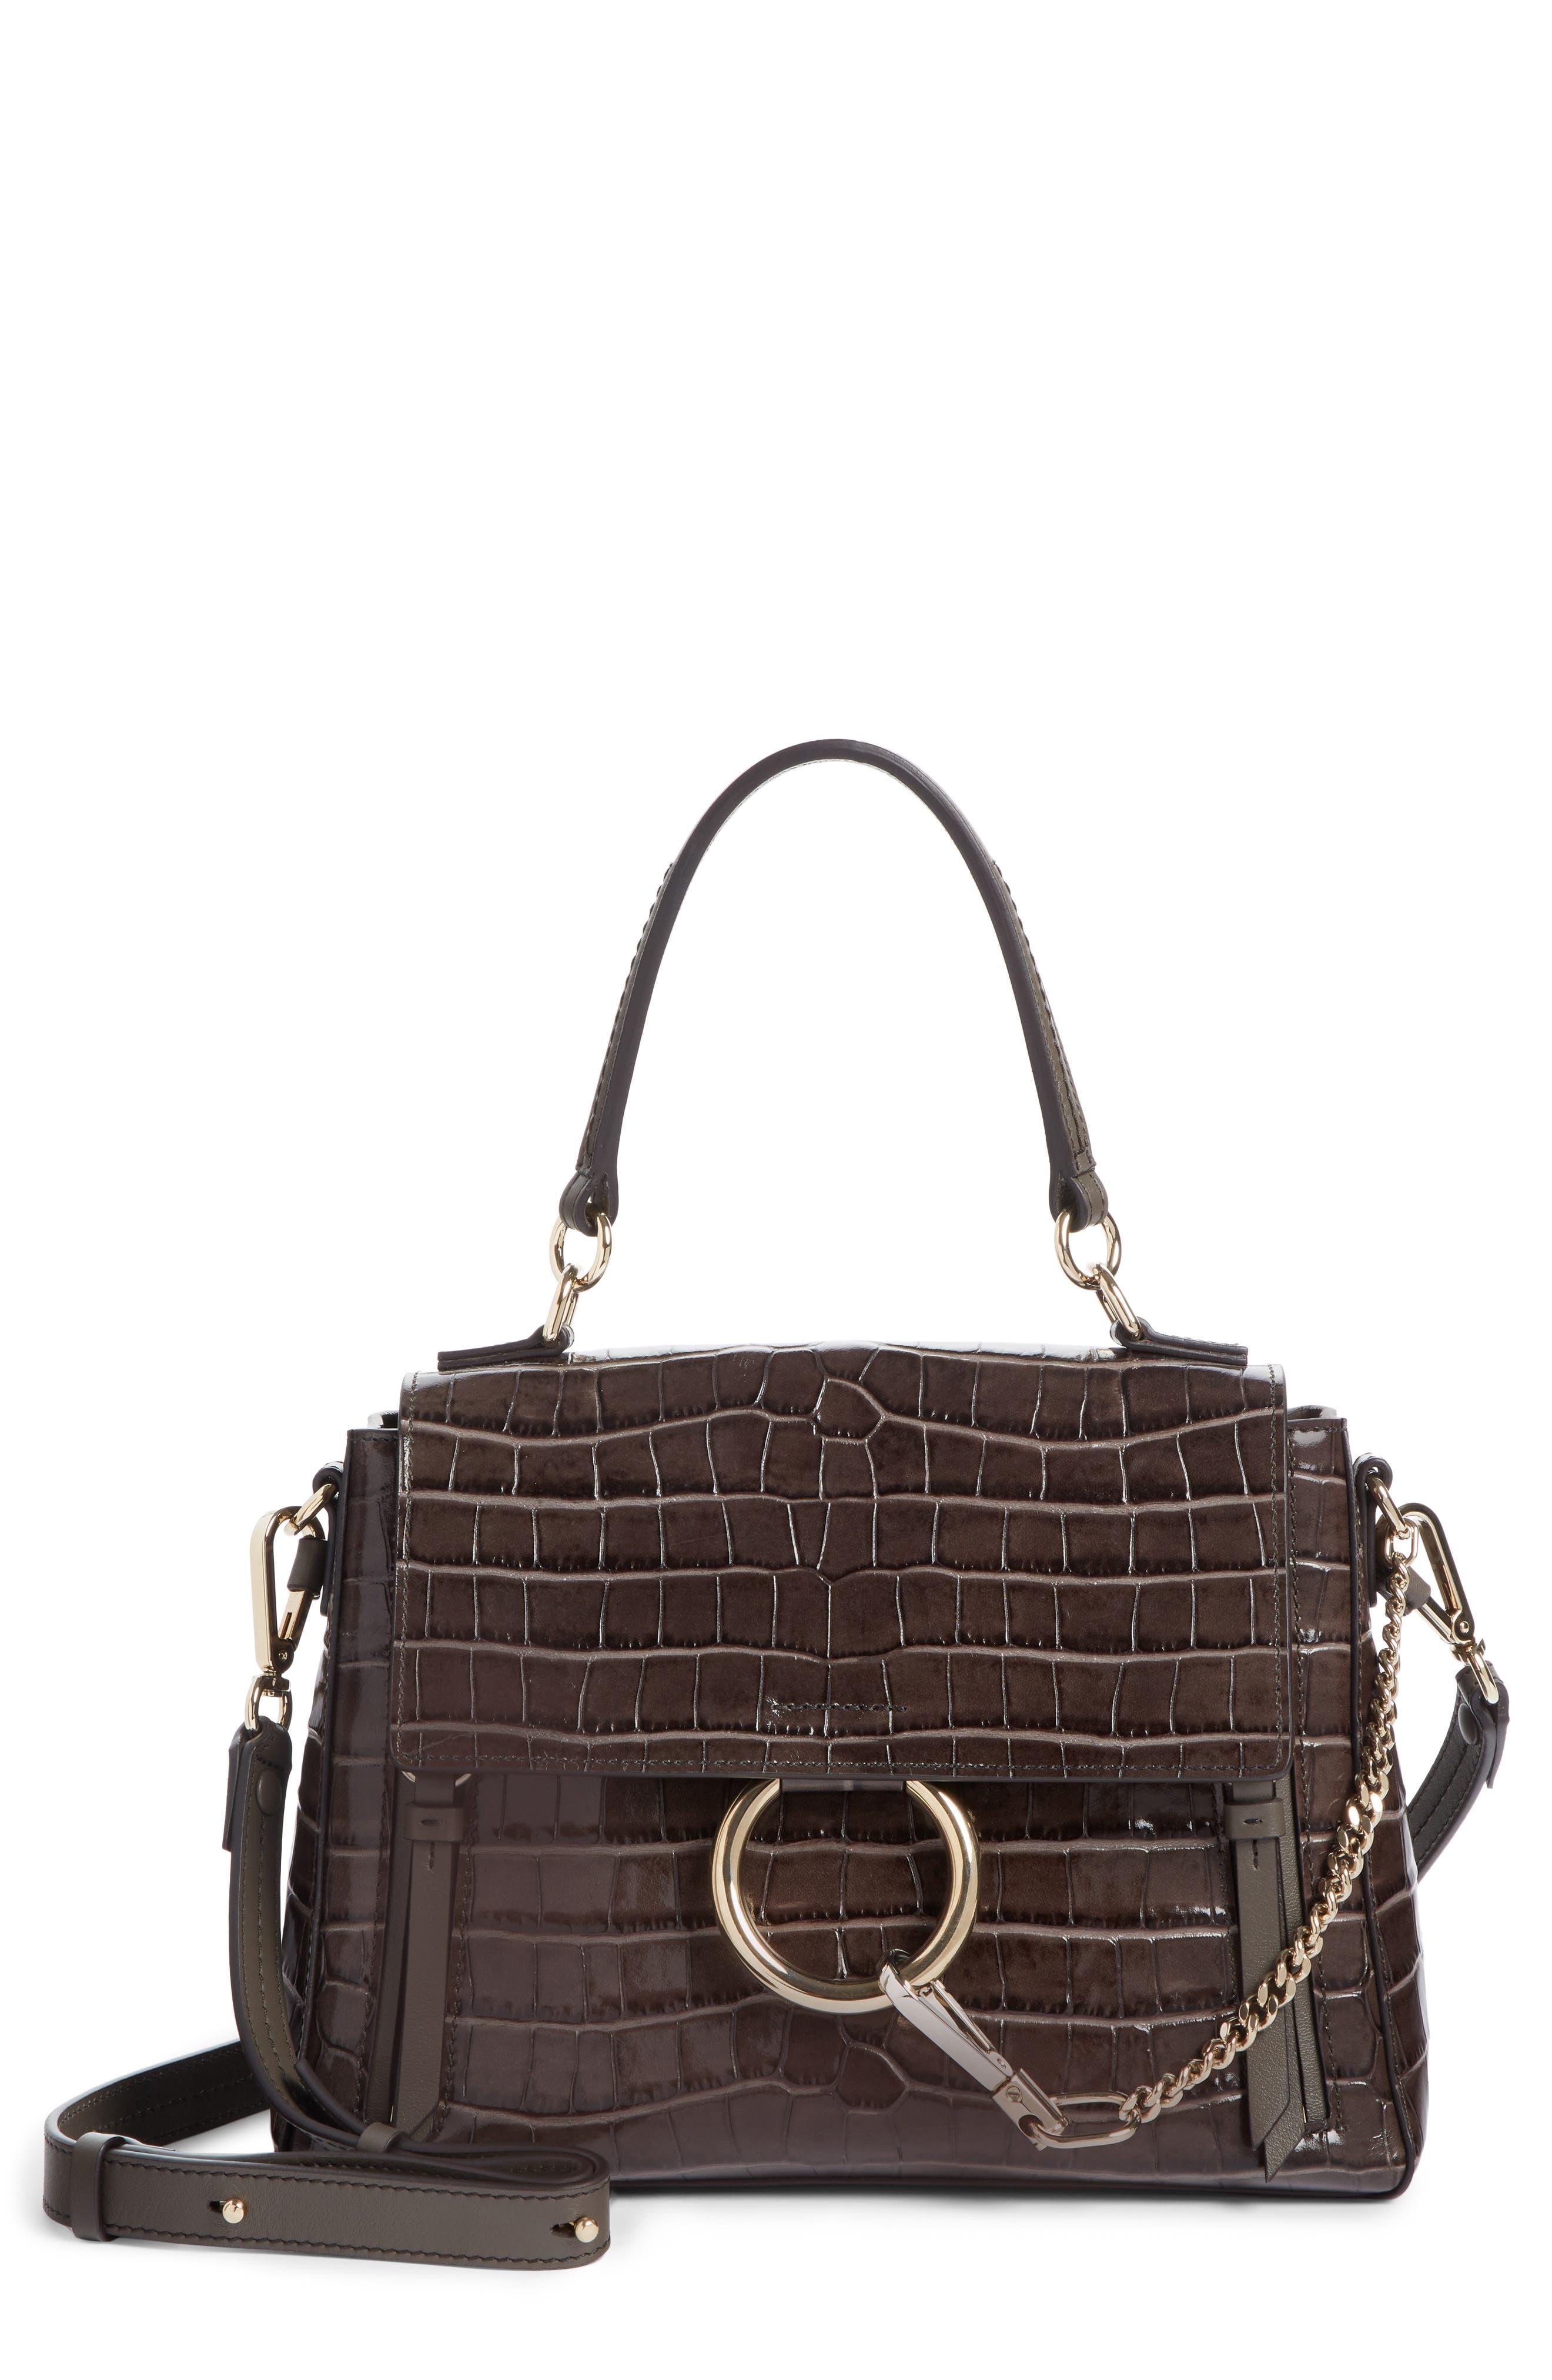 Medium Faye Day Croc Embossed Leather Shoulder Bag, Main, color, AUTUMNAL BROWN